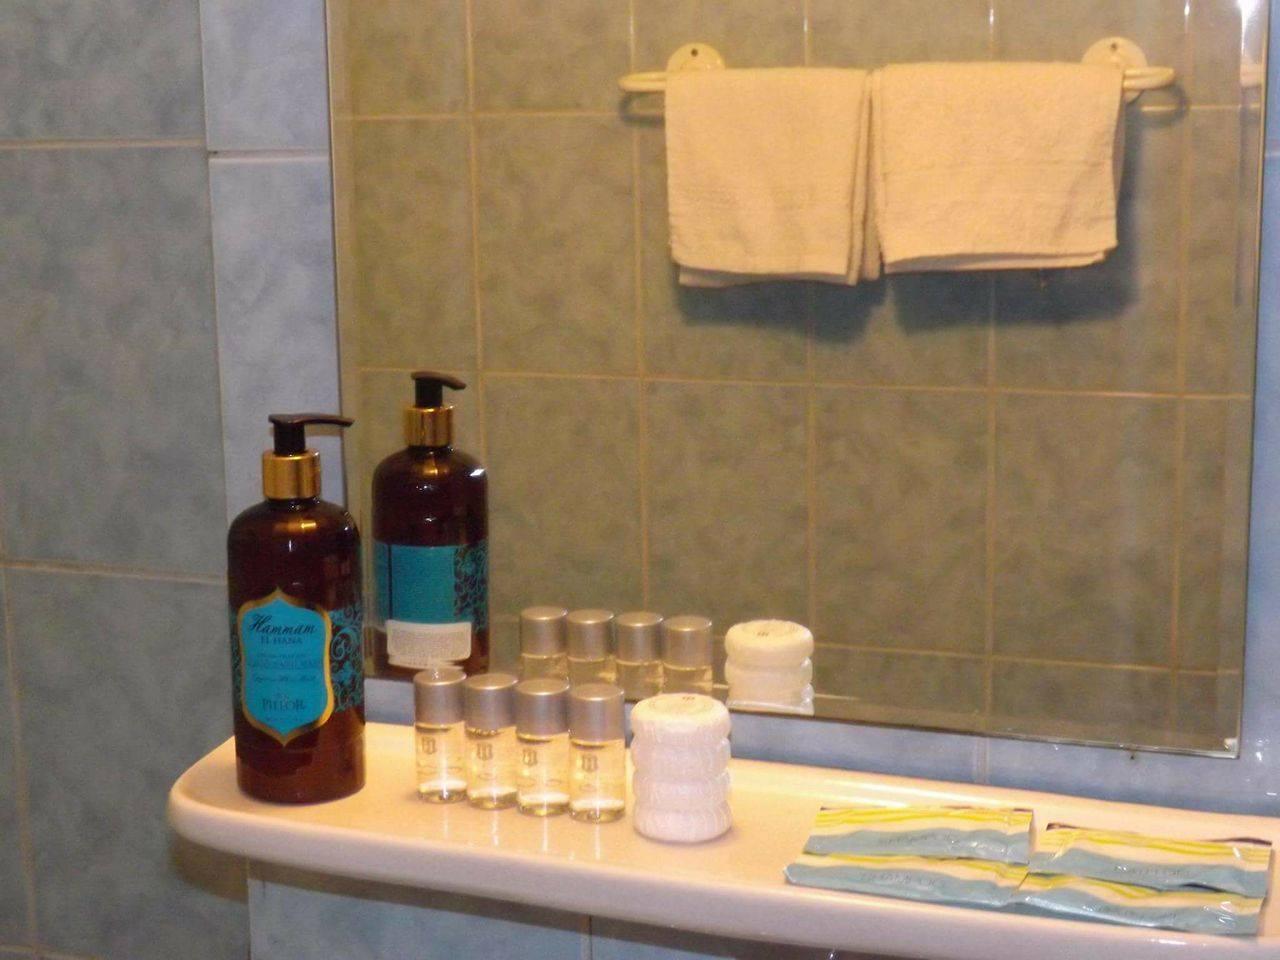 Dotari baie cu sapuneluri, gel dus, sapun lichid